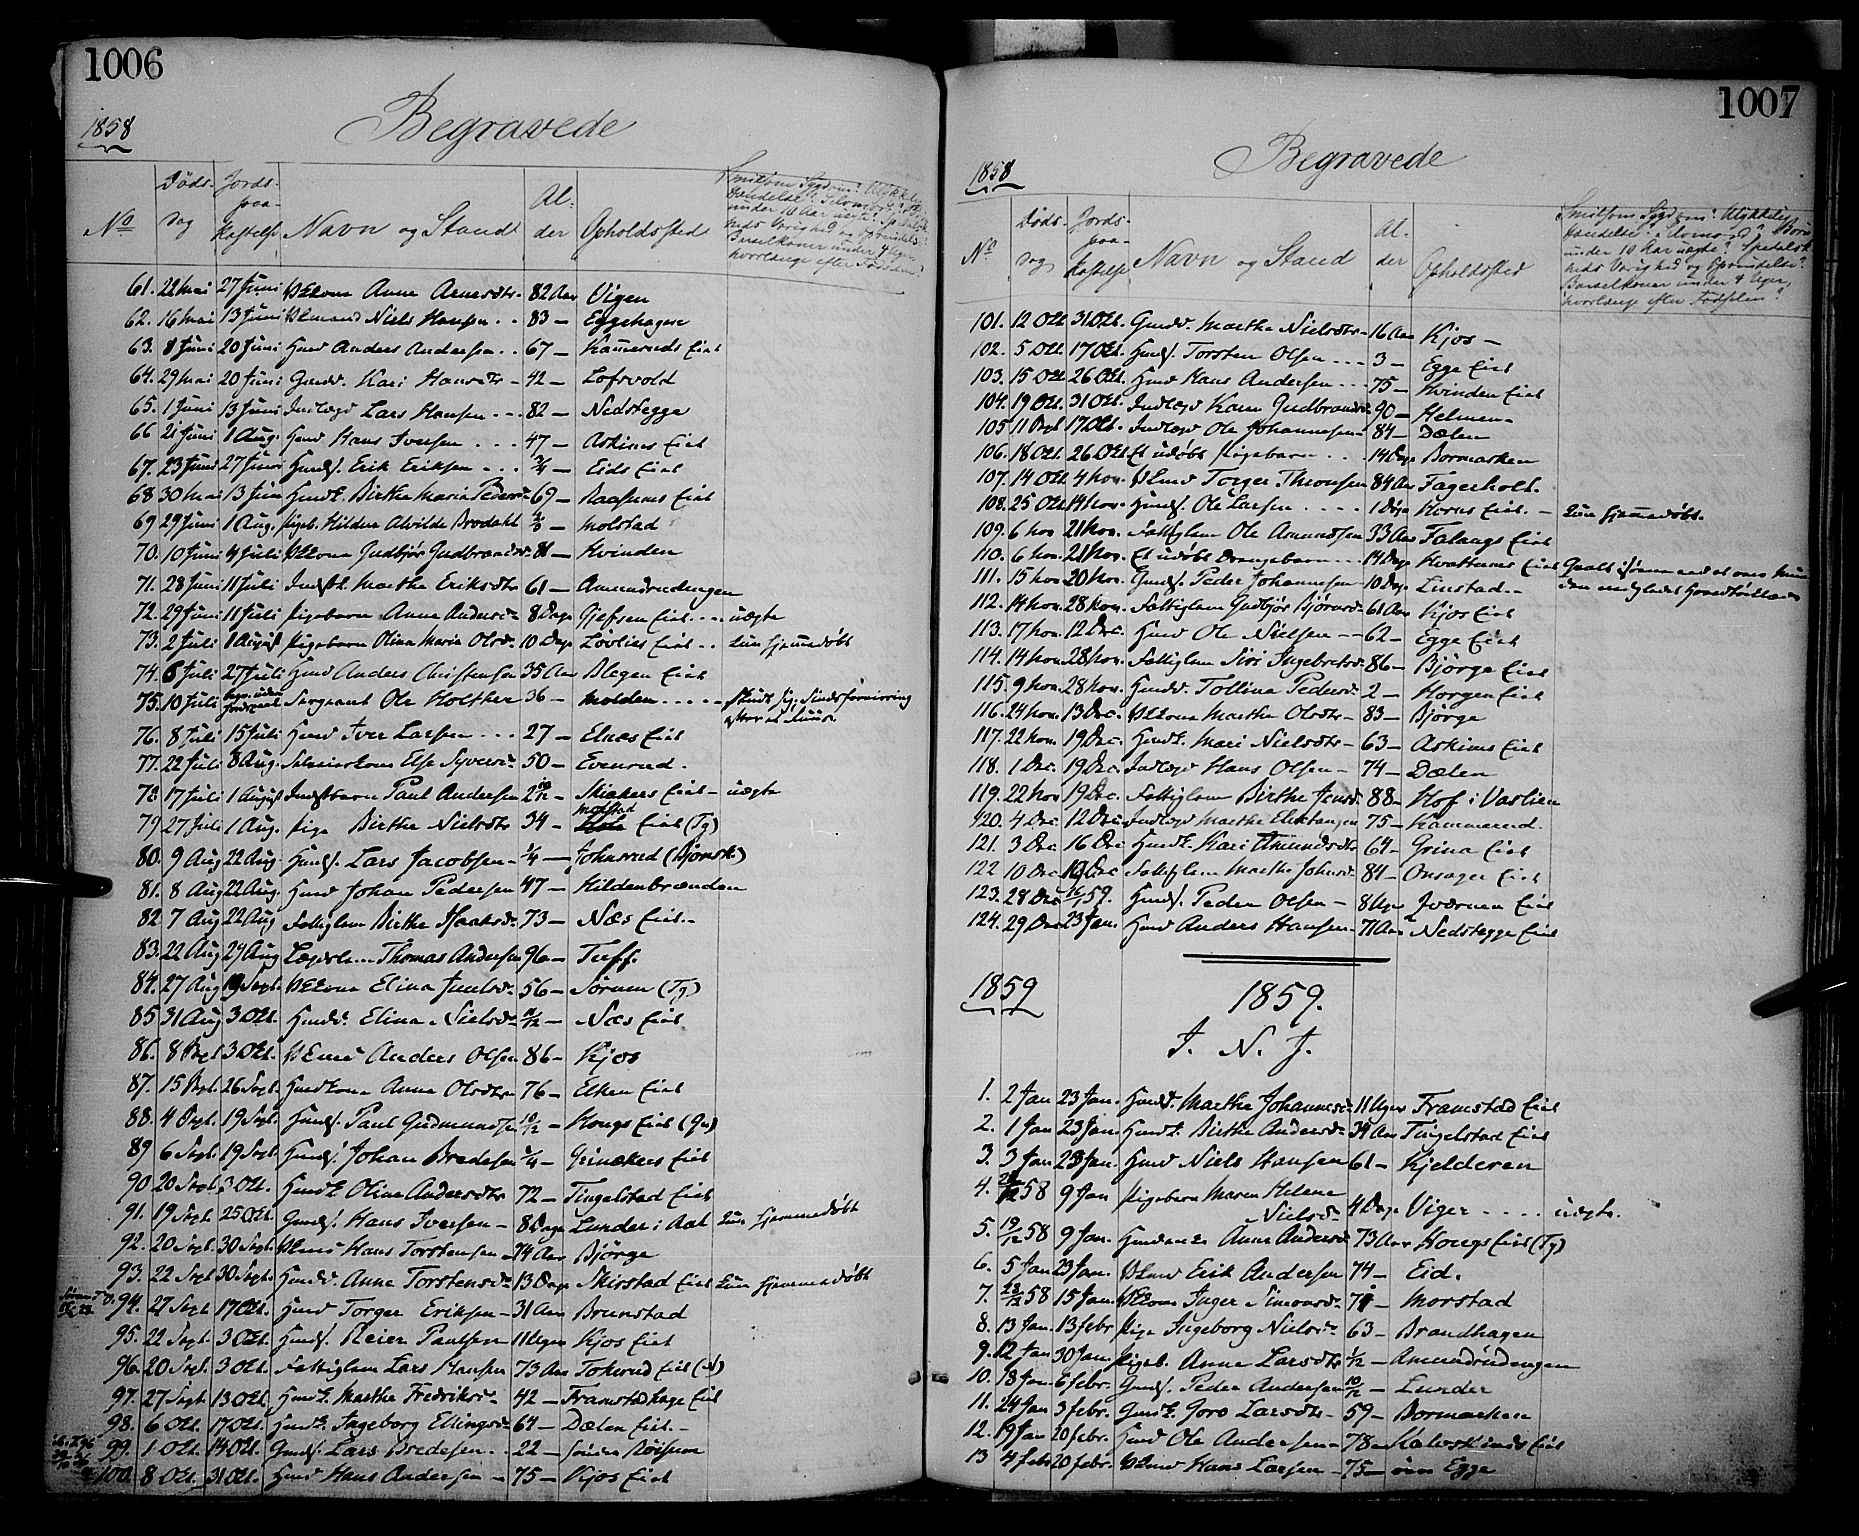 SAH, Gran prestekontor, Ministerialbok nr. 12, 1856-1874, s. 1006-1007